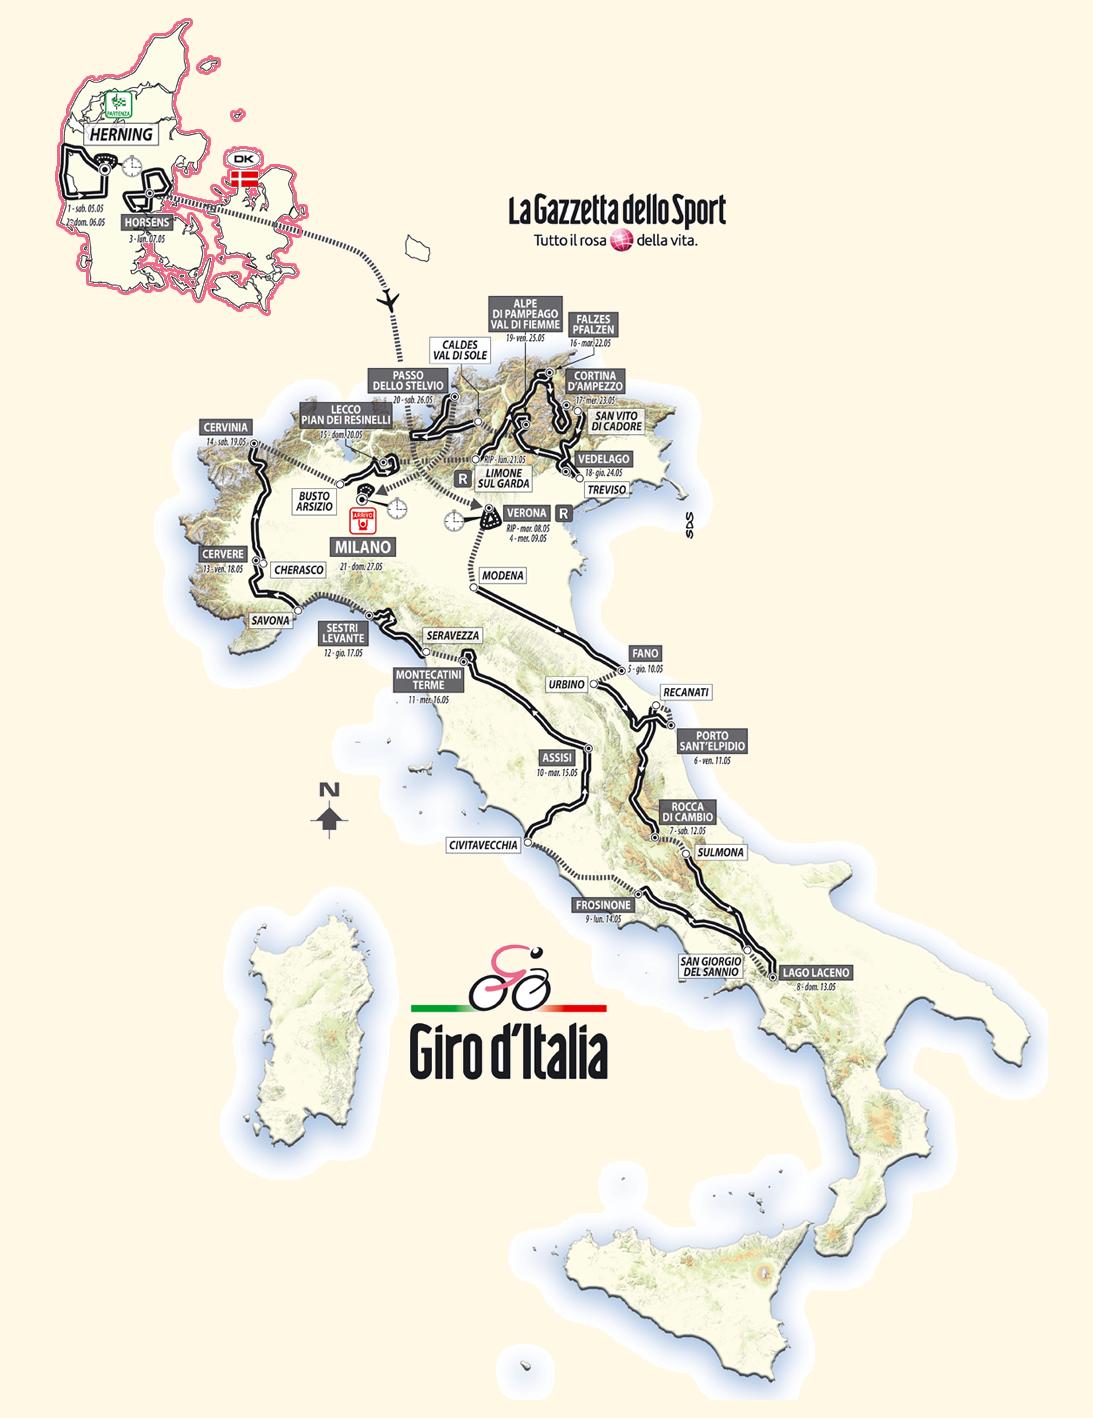 The Giro d'Italia 2012